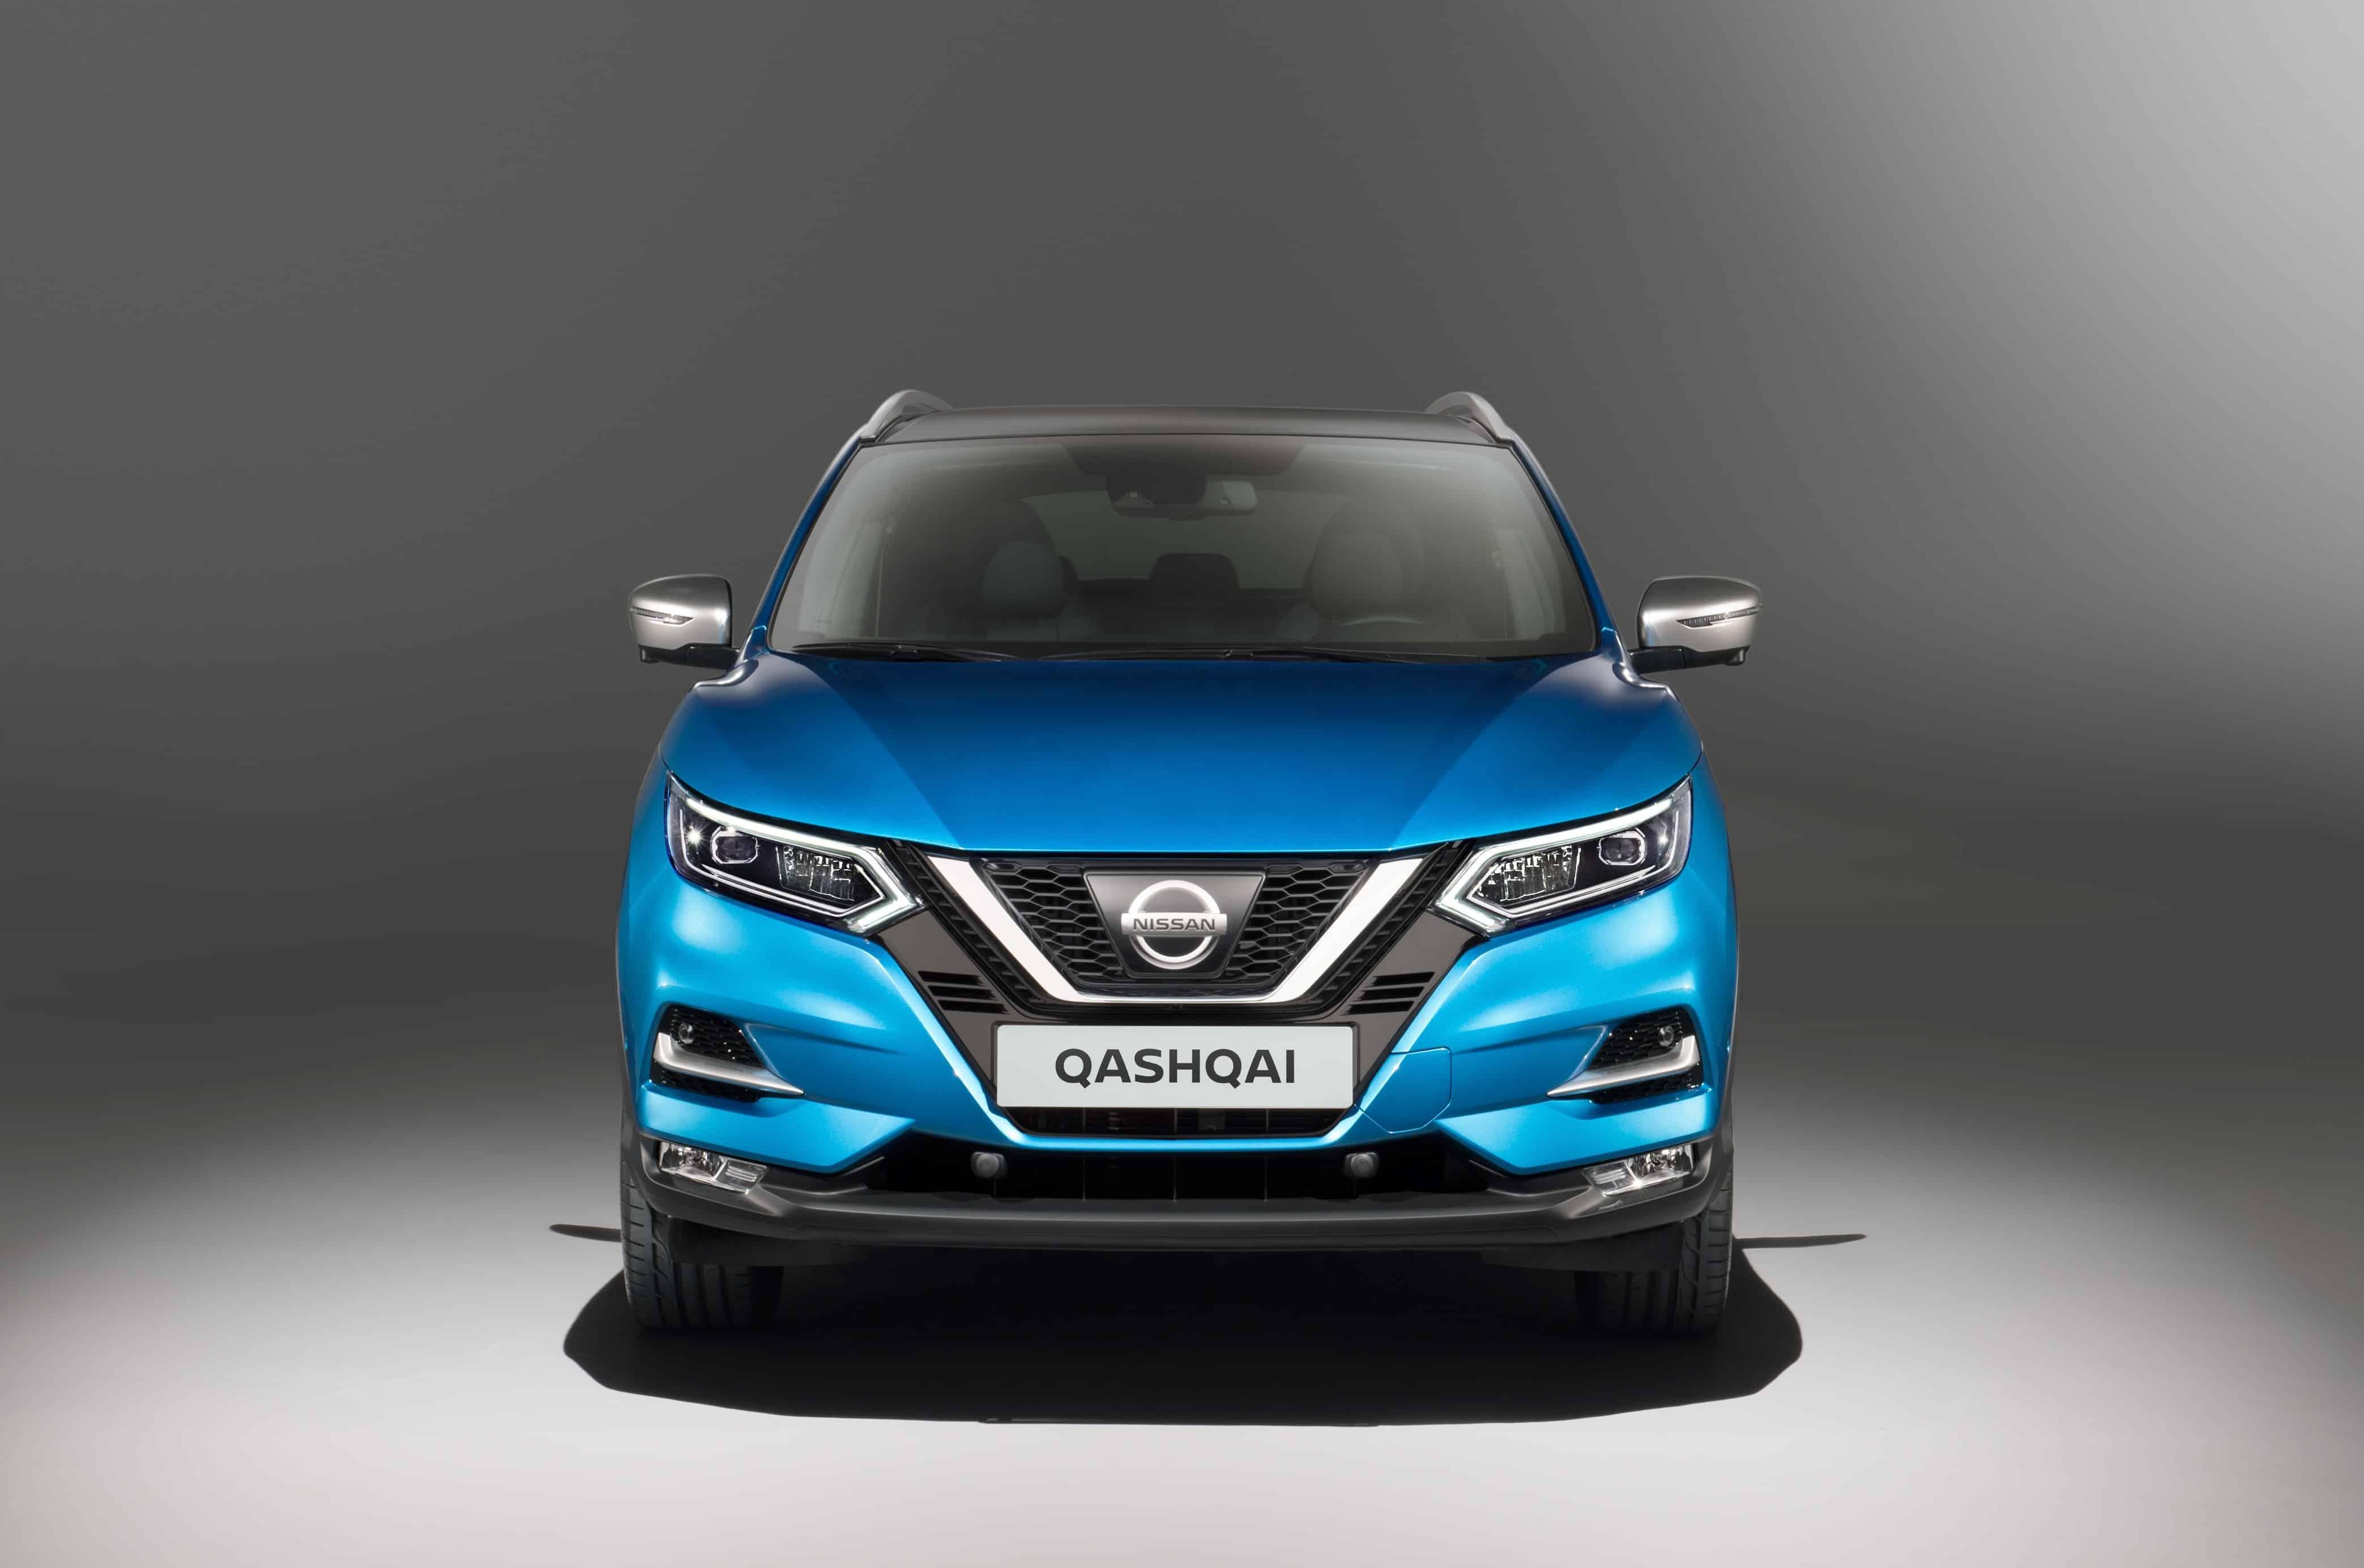 Nissan Qashqai - Ireland's Best Selling Car in October 2018.